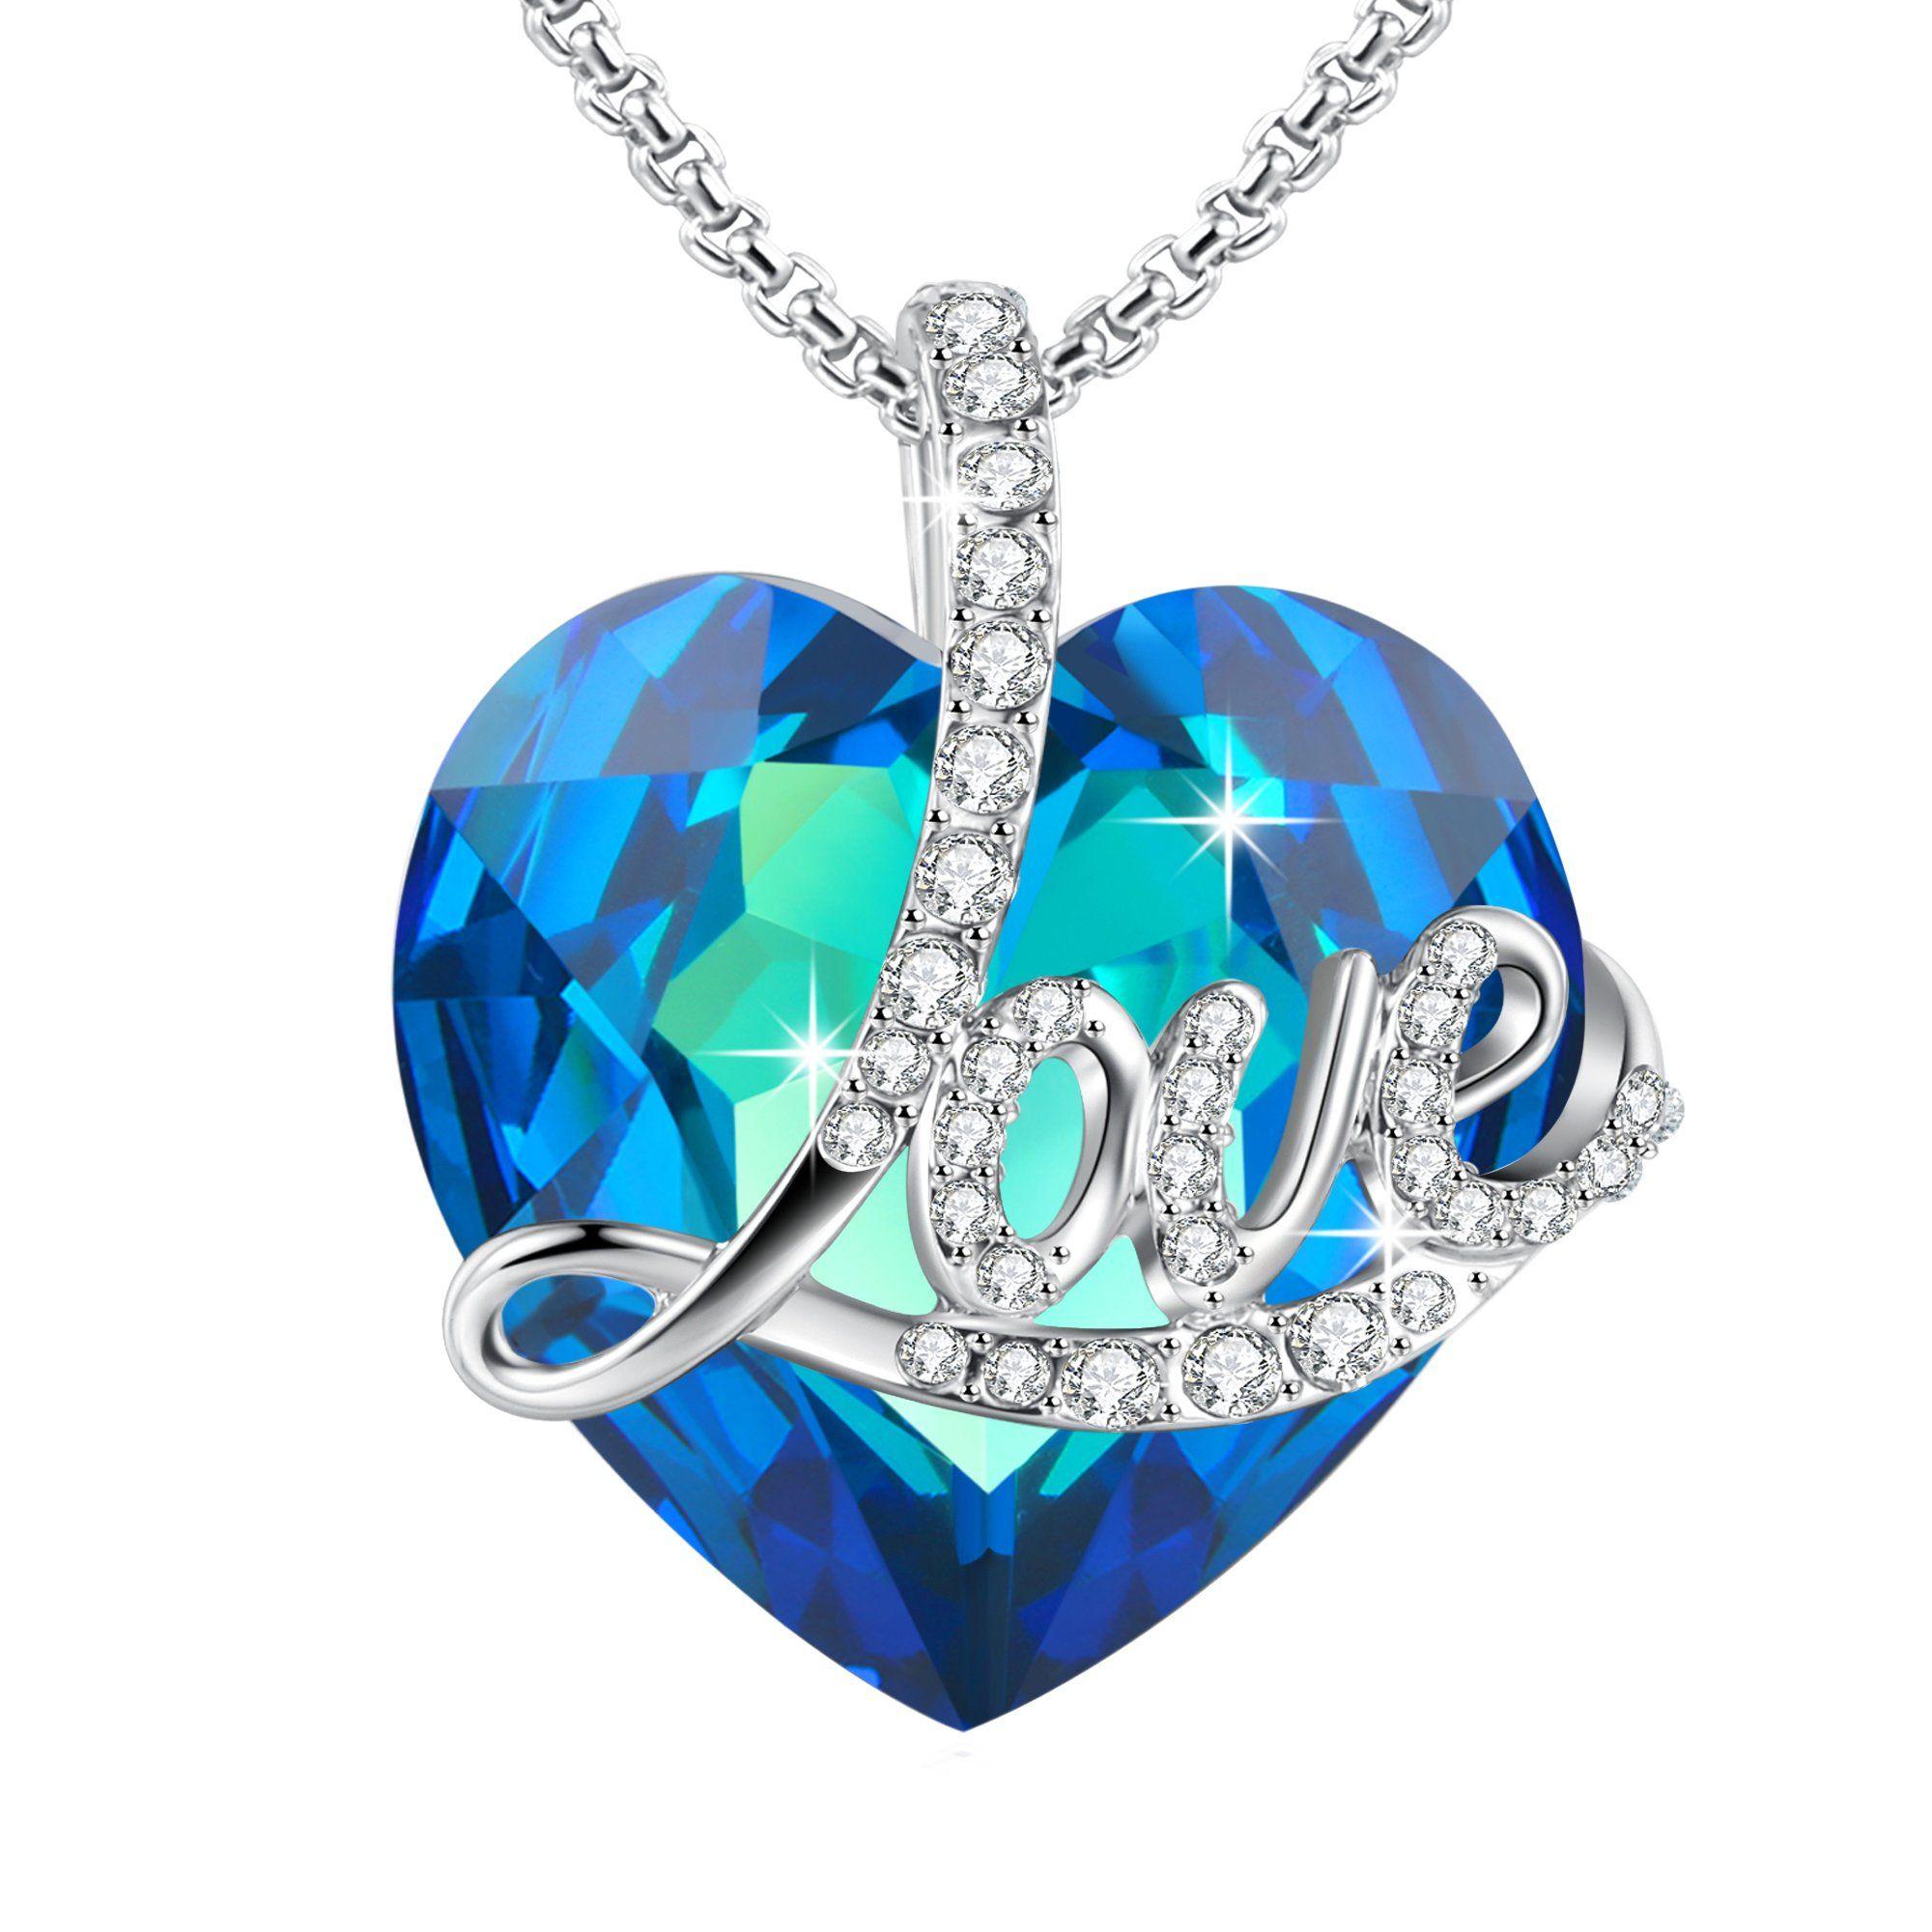 AngeladyBlue Love Heart Pendant Necklace of Swarovski